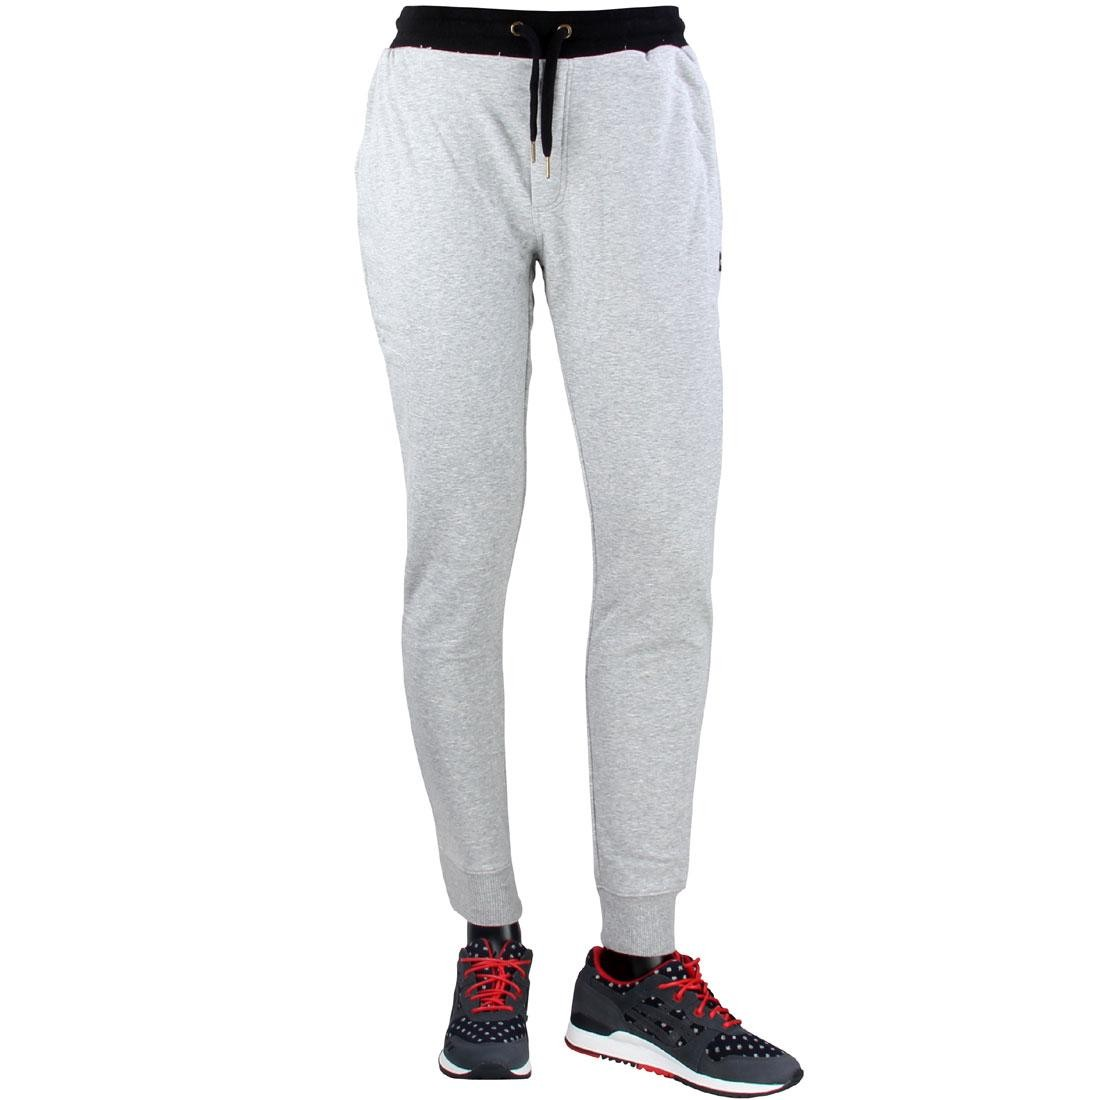 Barney Cools Men Weekend Pants (gray / melange)